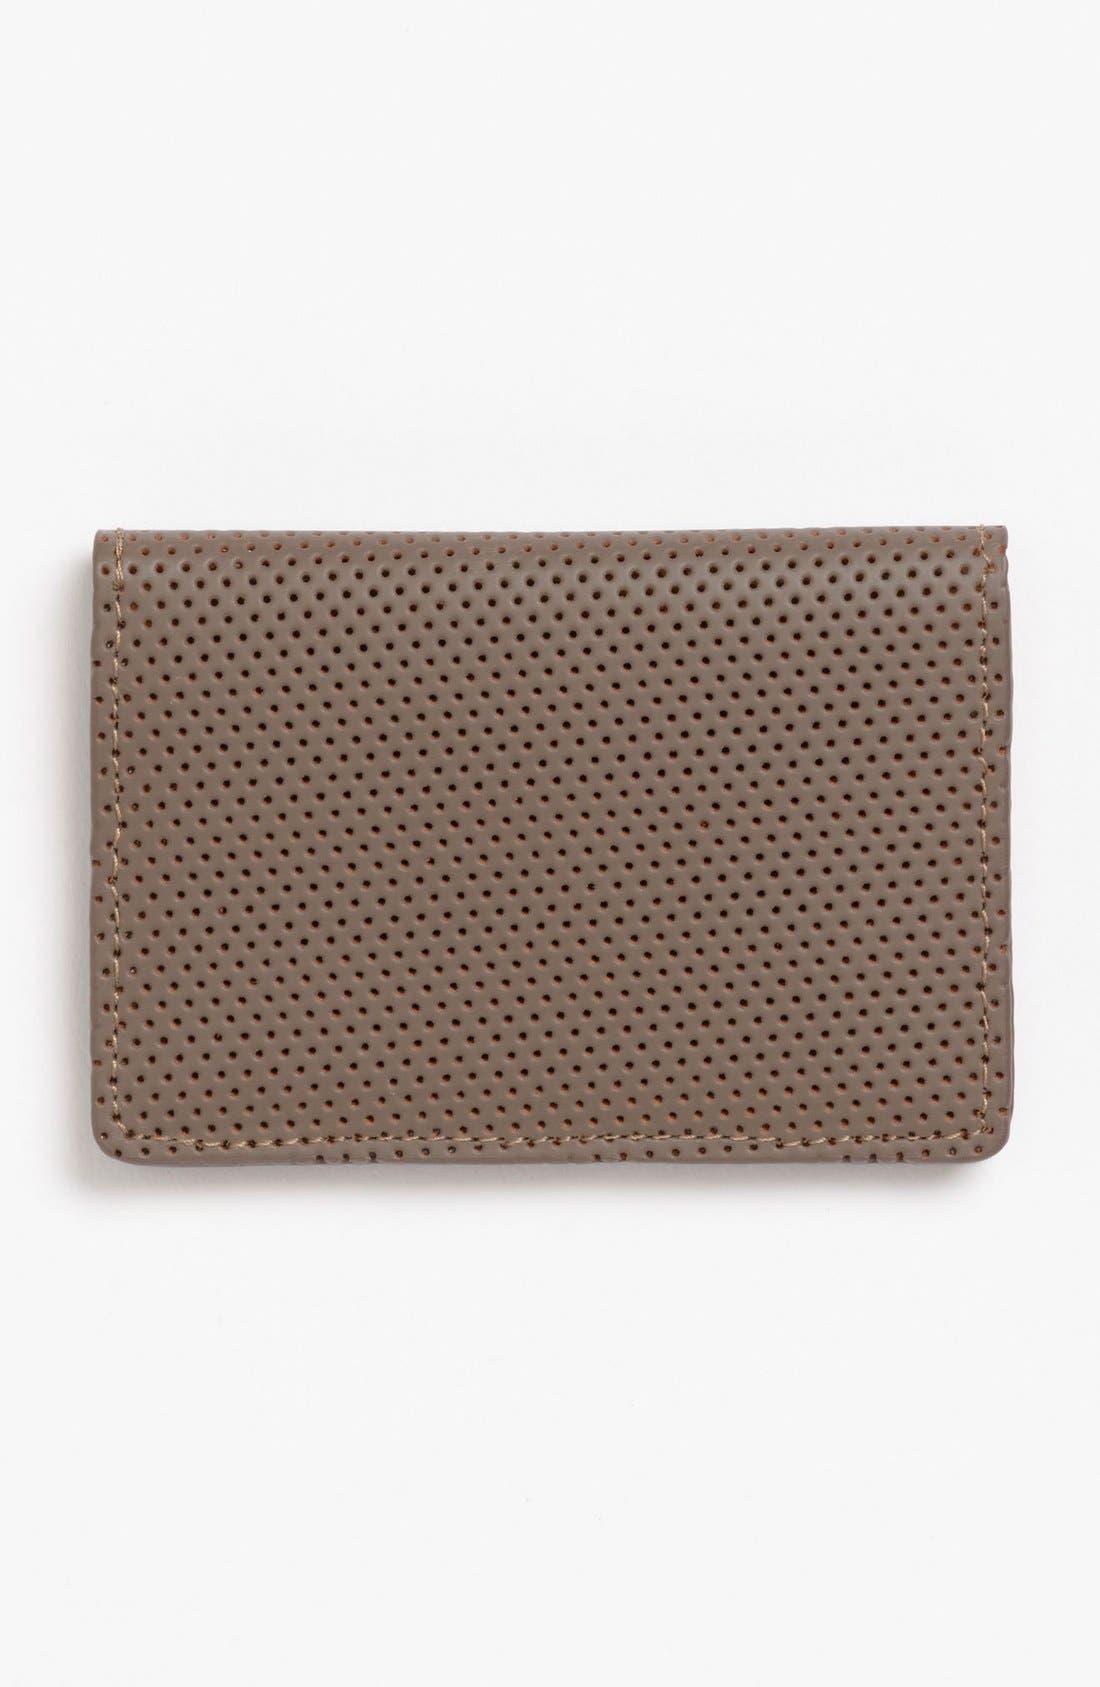 Alternate Image 1 Selected - J Fold 'Microperf' Folding Card Holder